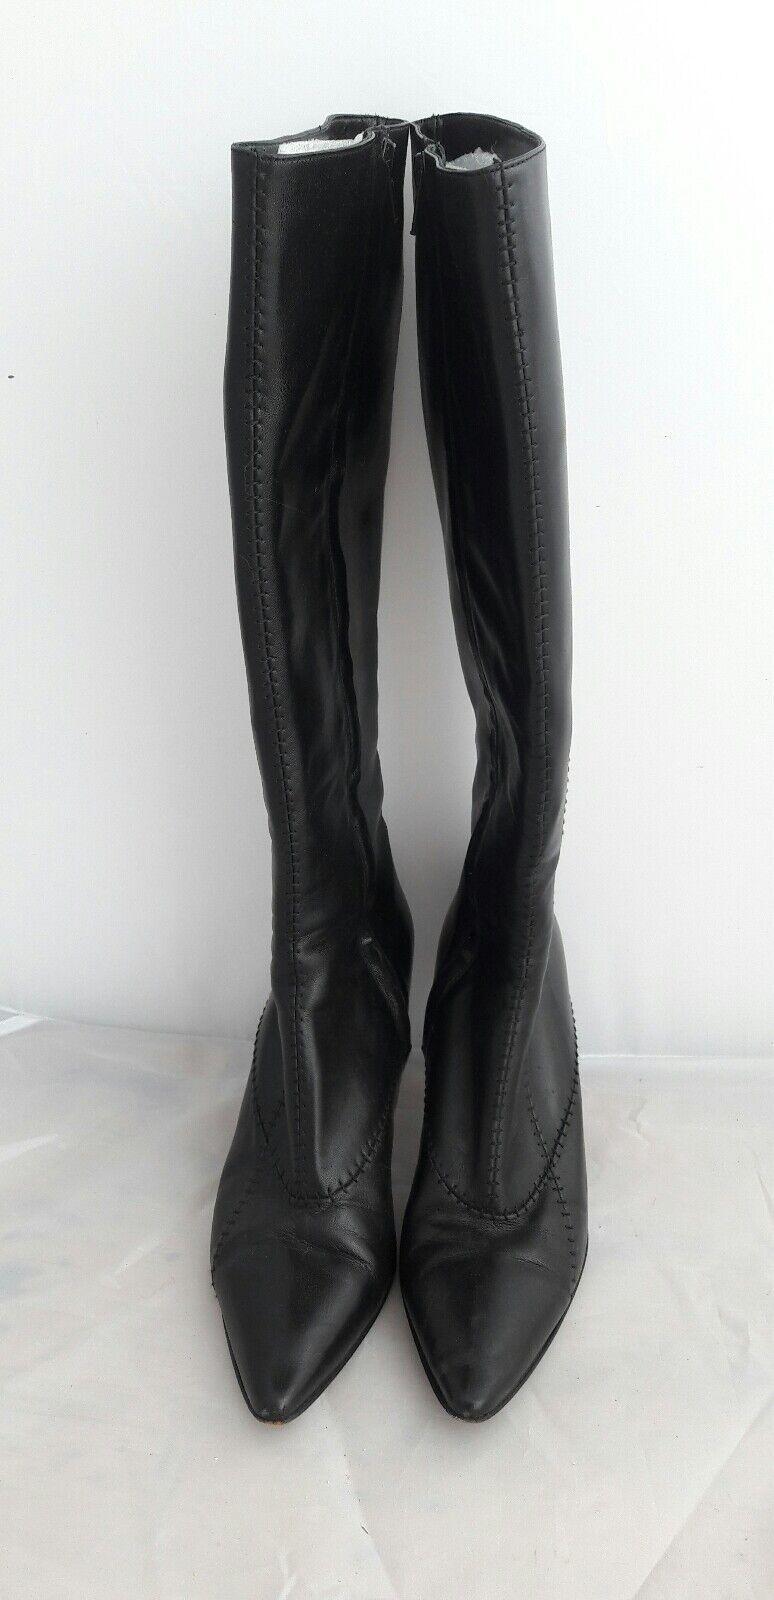 René Lezard botas Stiletto negro tacón alto, hermosa elegante